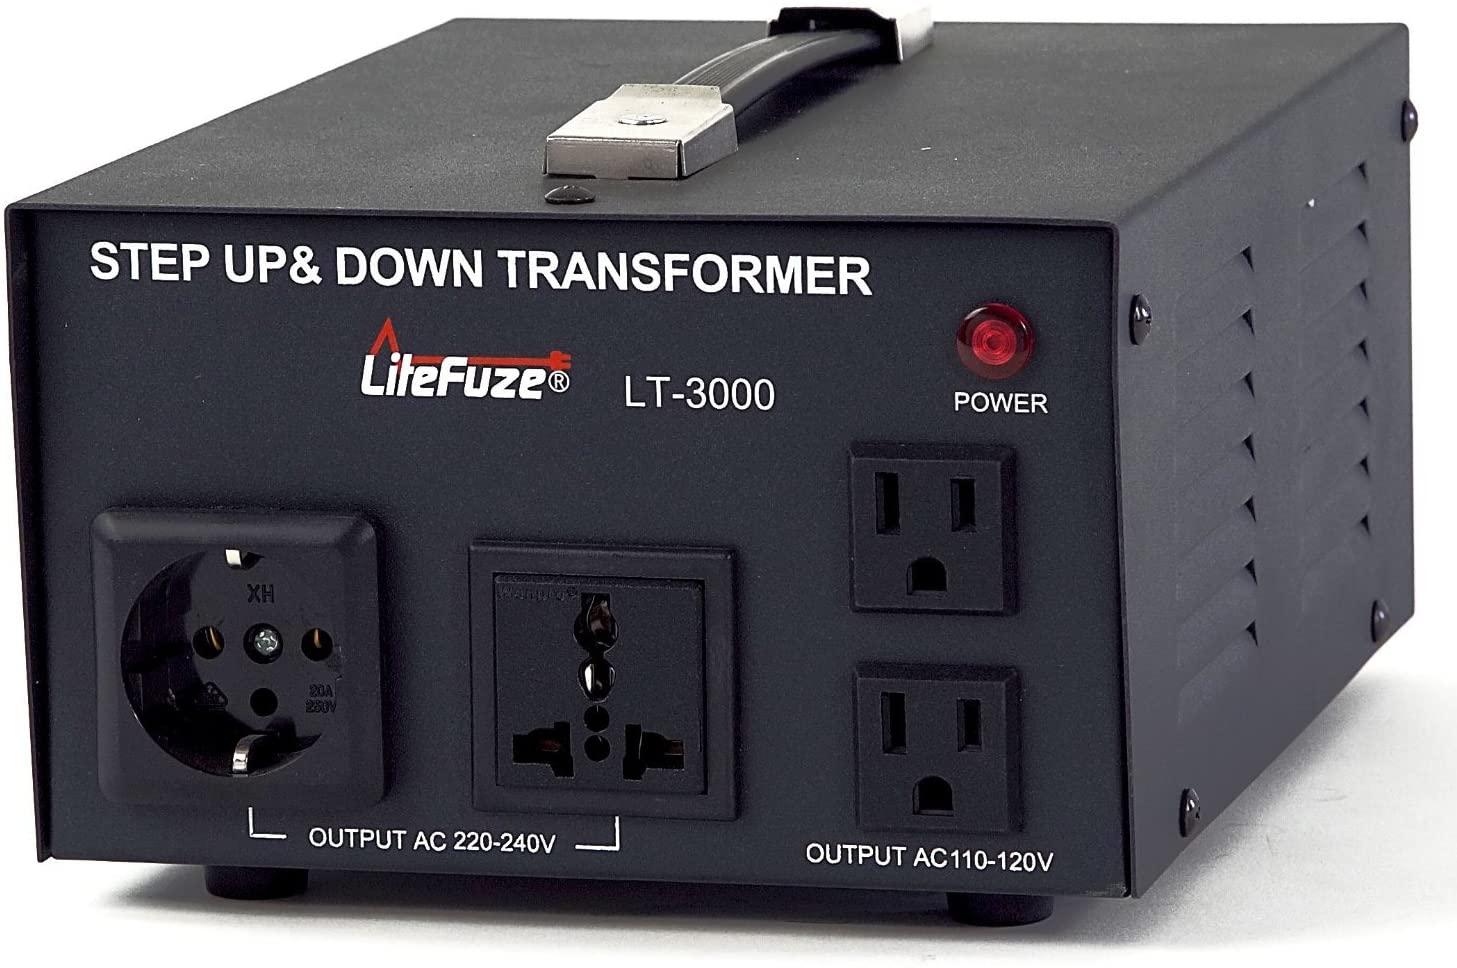 3000 Watt Voltage Converter Transformer by LiteFuze - Step Up/Down - 110V/220V - Circuit Breaker Protection -Heavy Duty/ - Convertingbox Technology - LT Series [5-Years Warranty]